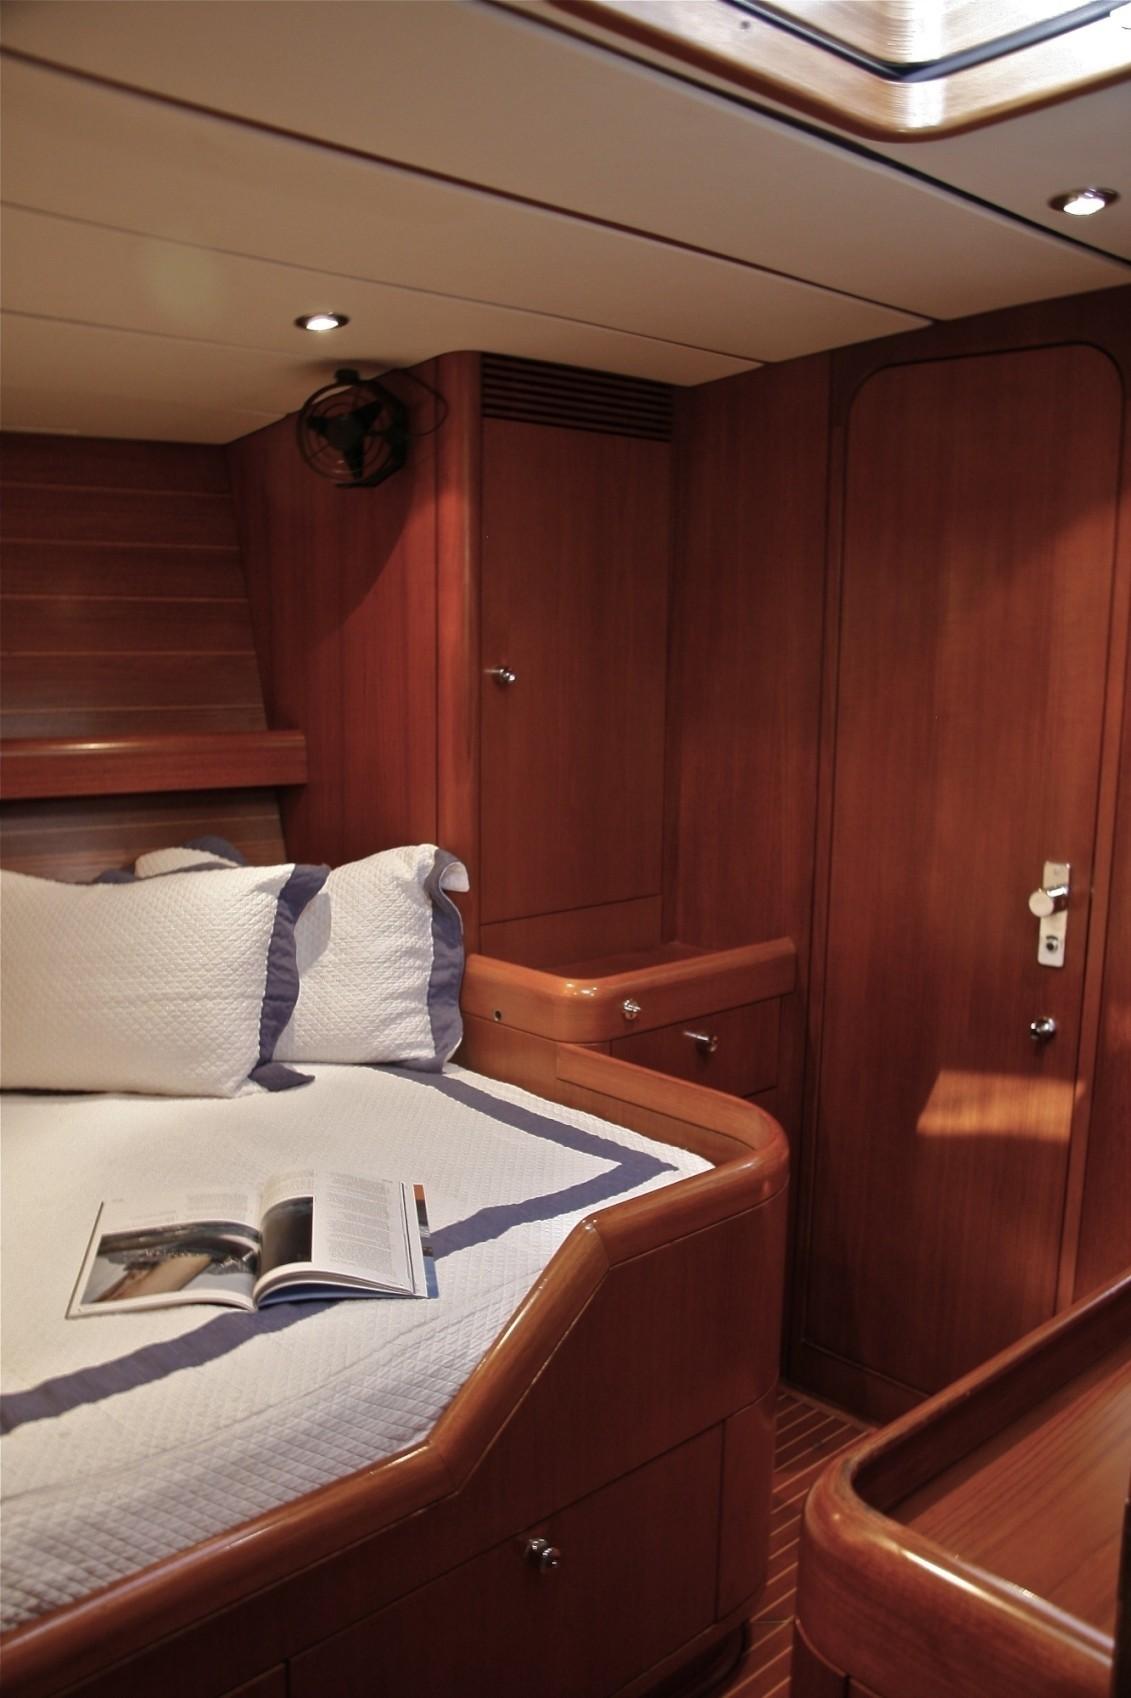 The 26m Yacht ASPIRATION